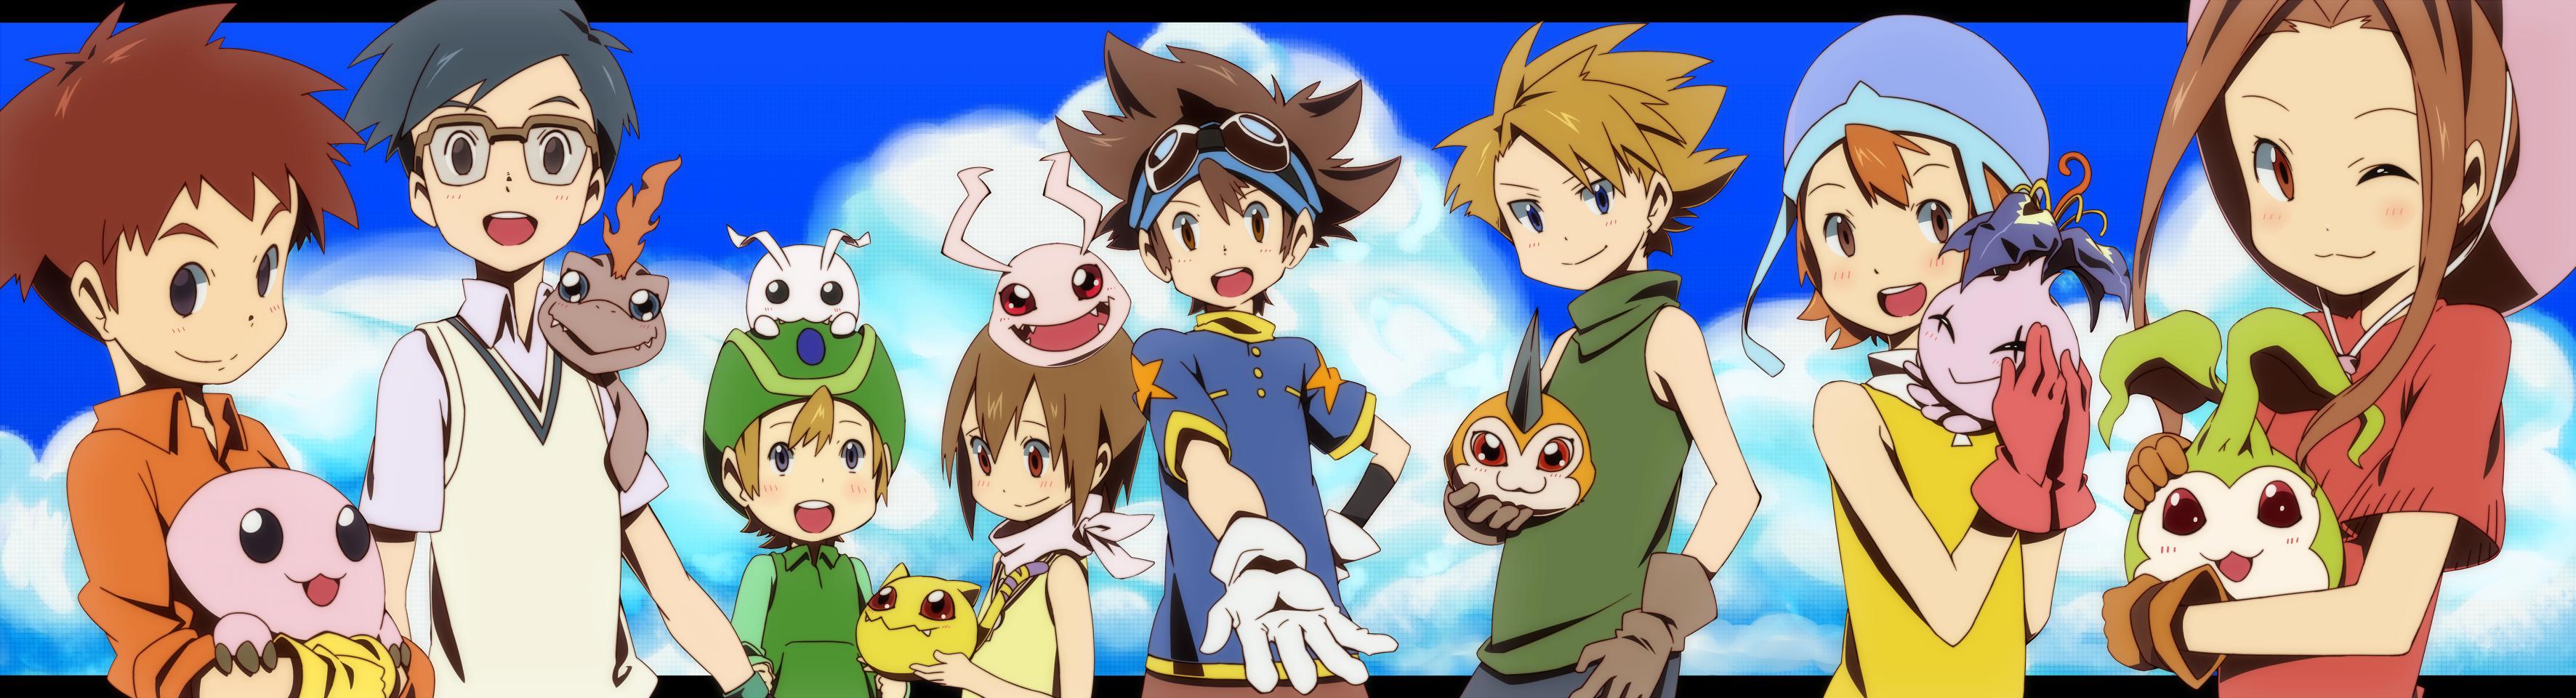 Digimon is better than Pokemon